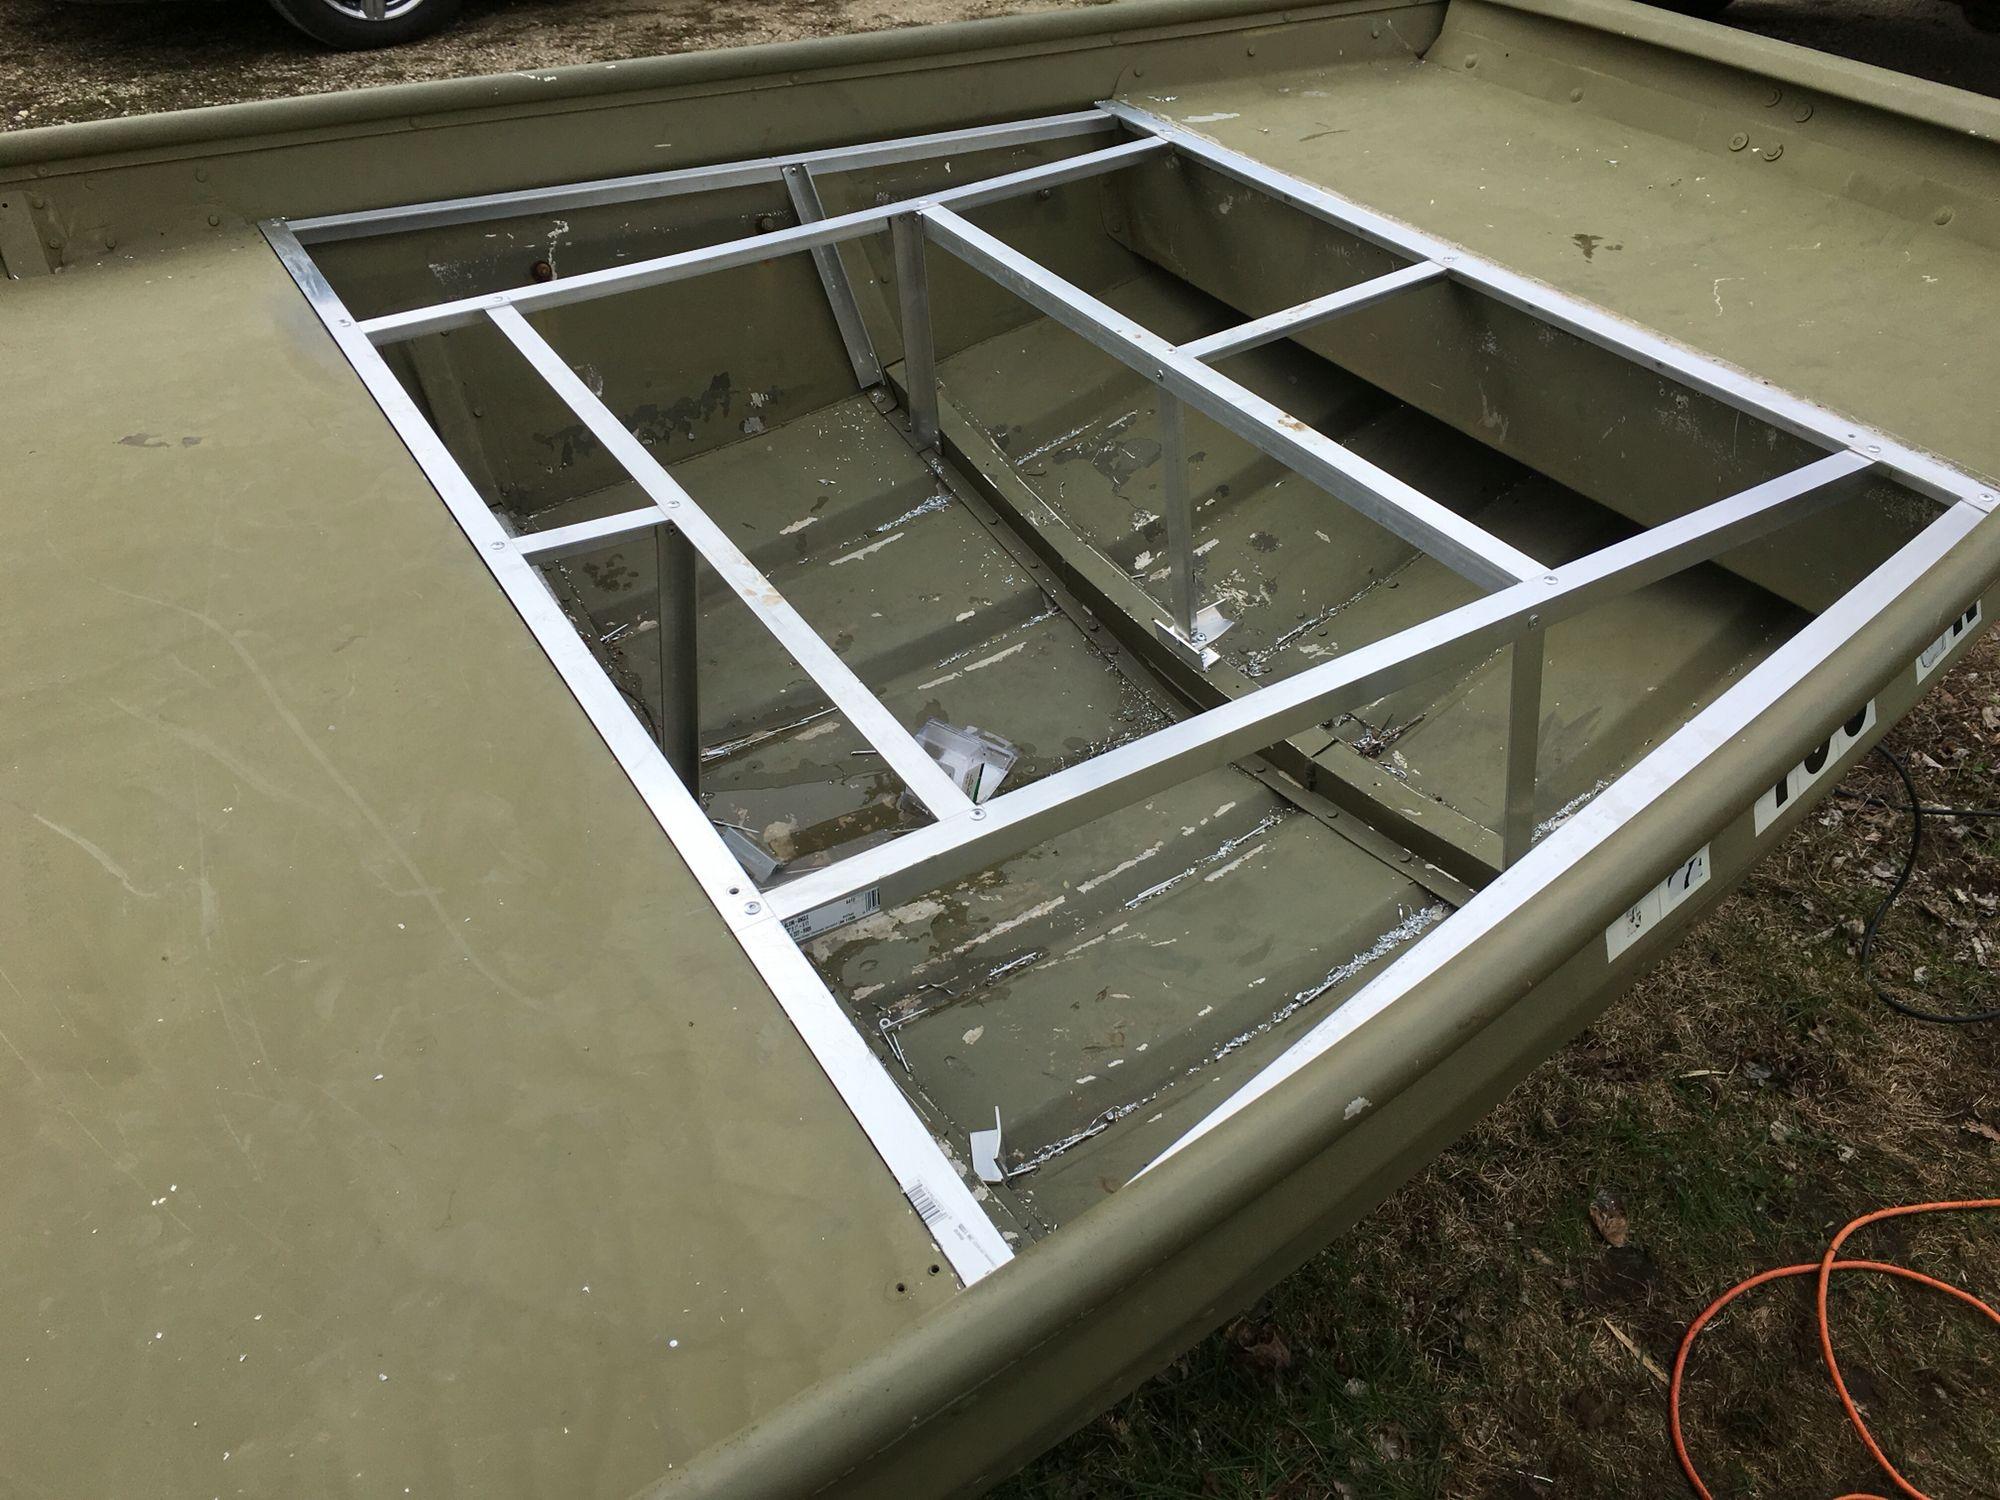 My Jon Boat Build Boat Stuff Jon Boat Trailer Boat